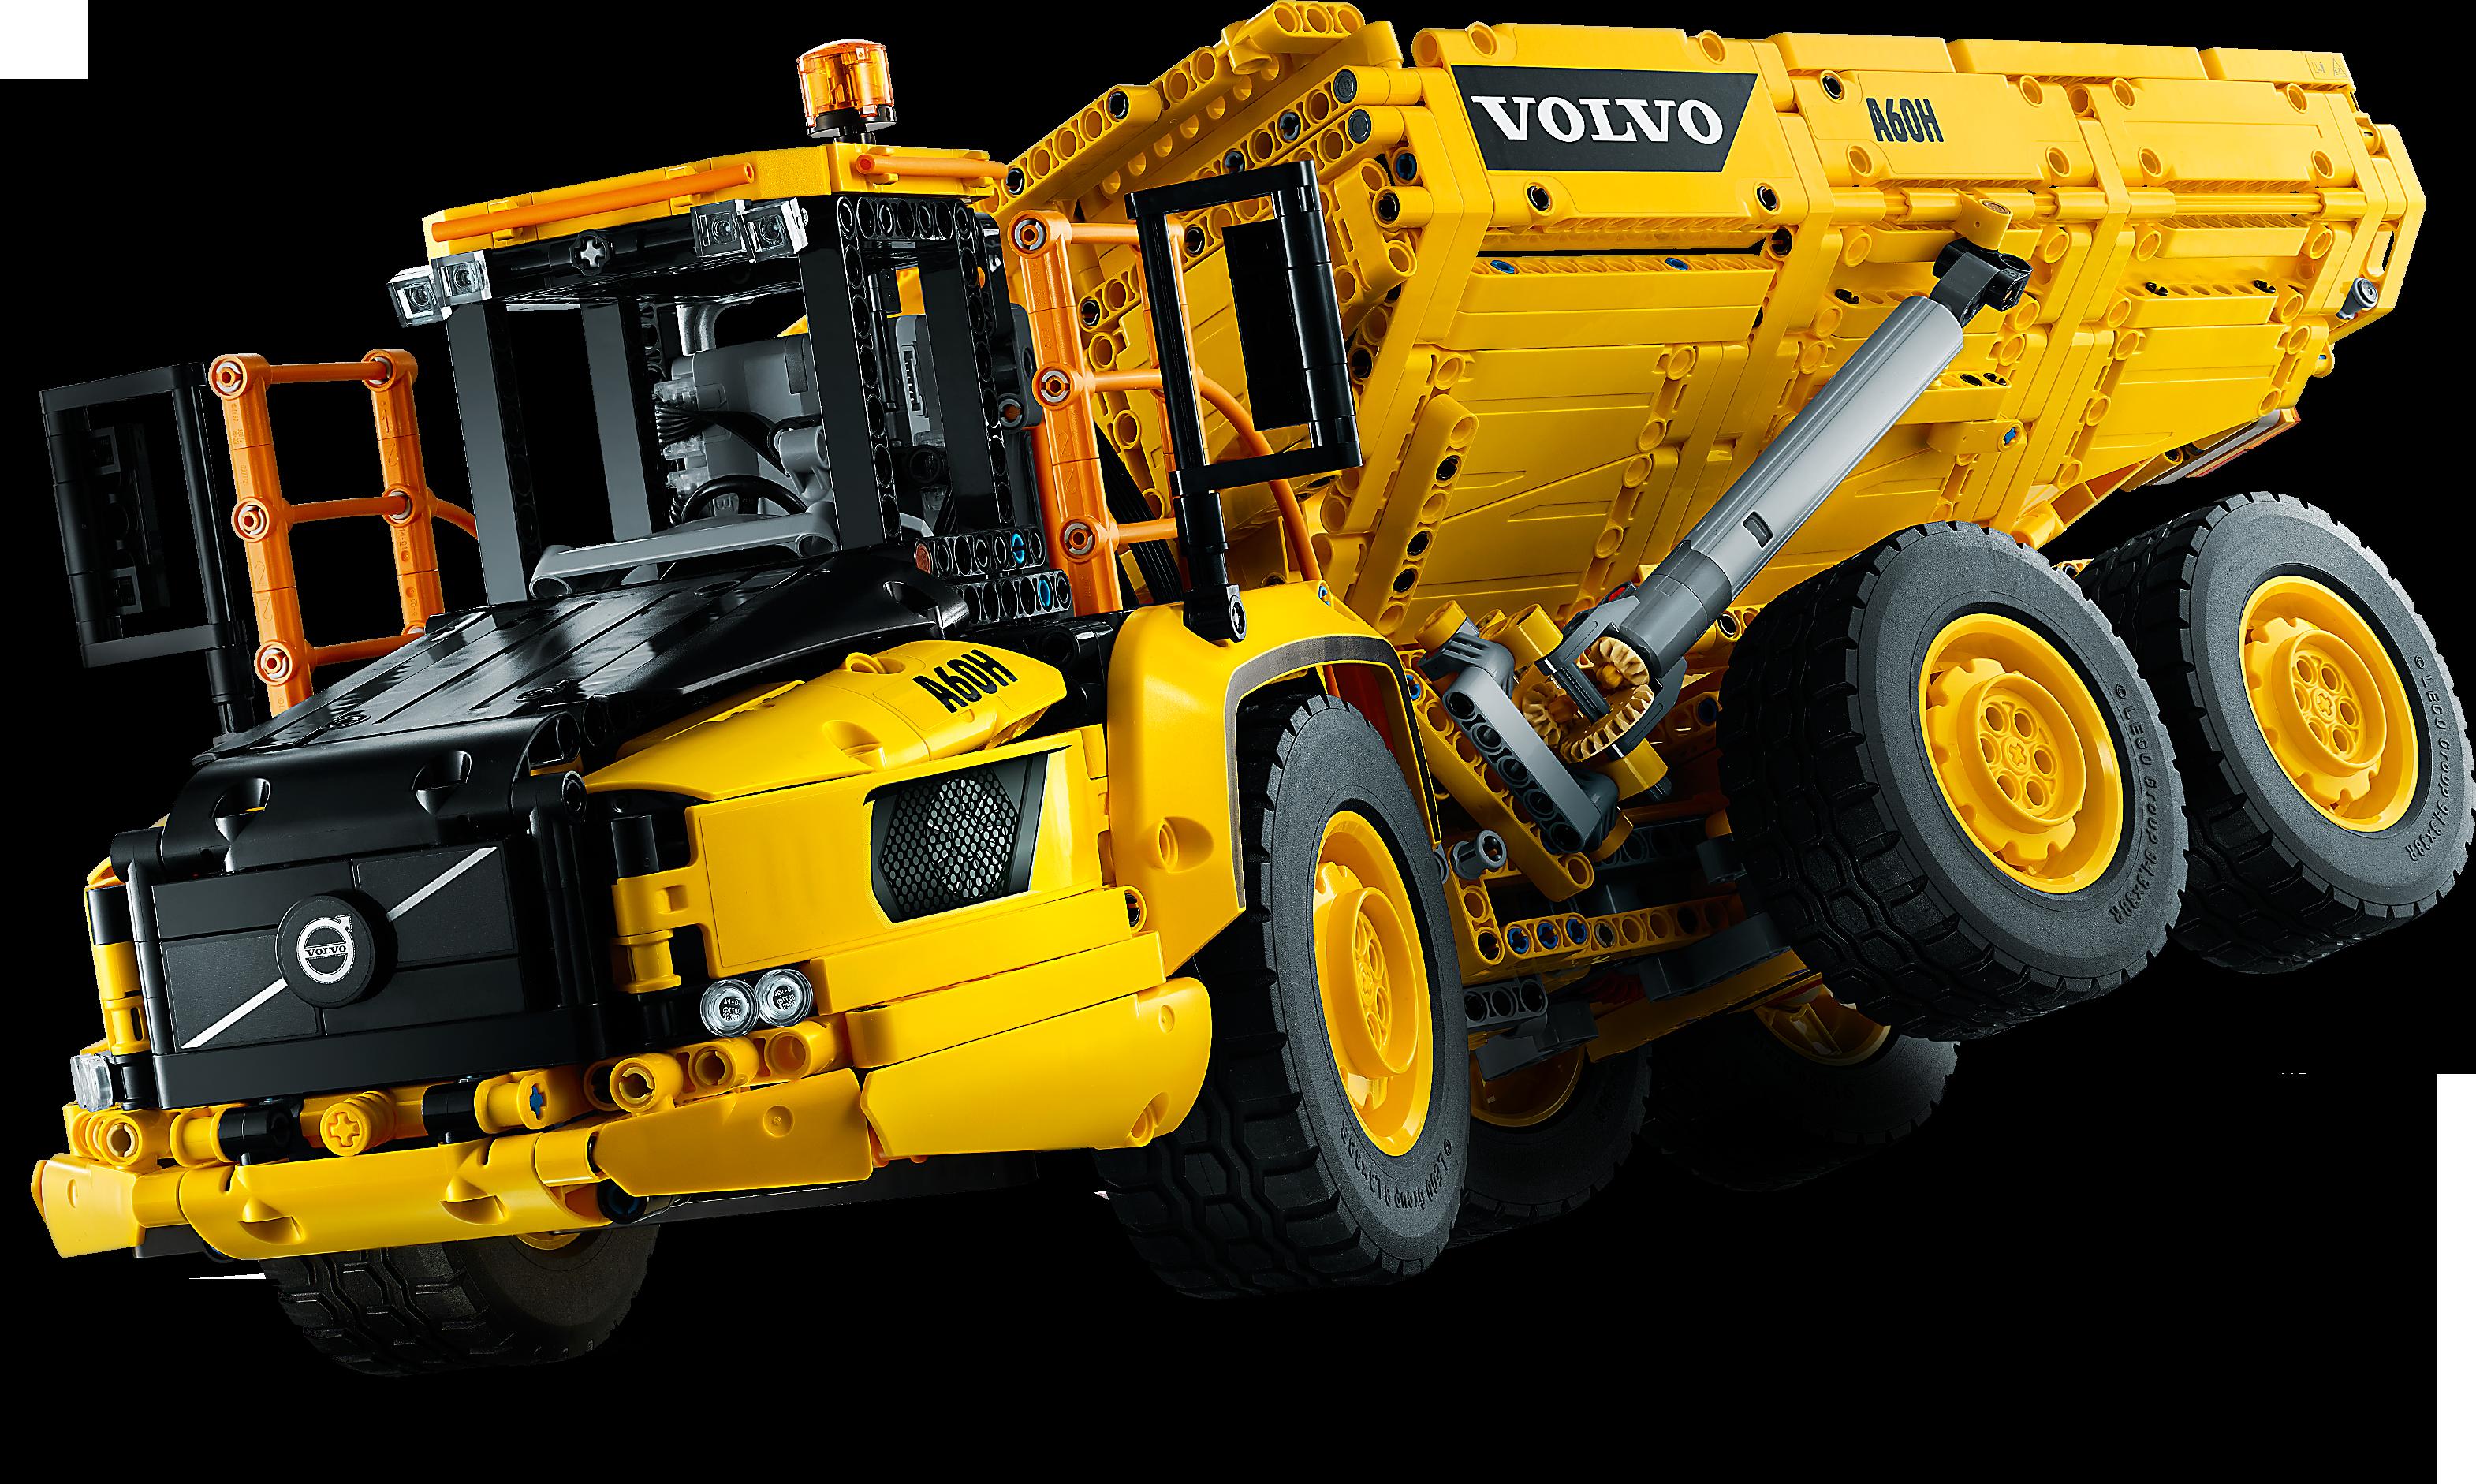 6x6 Volvo Articulated Hauler